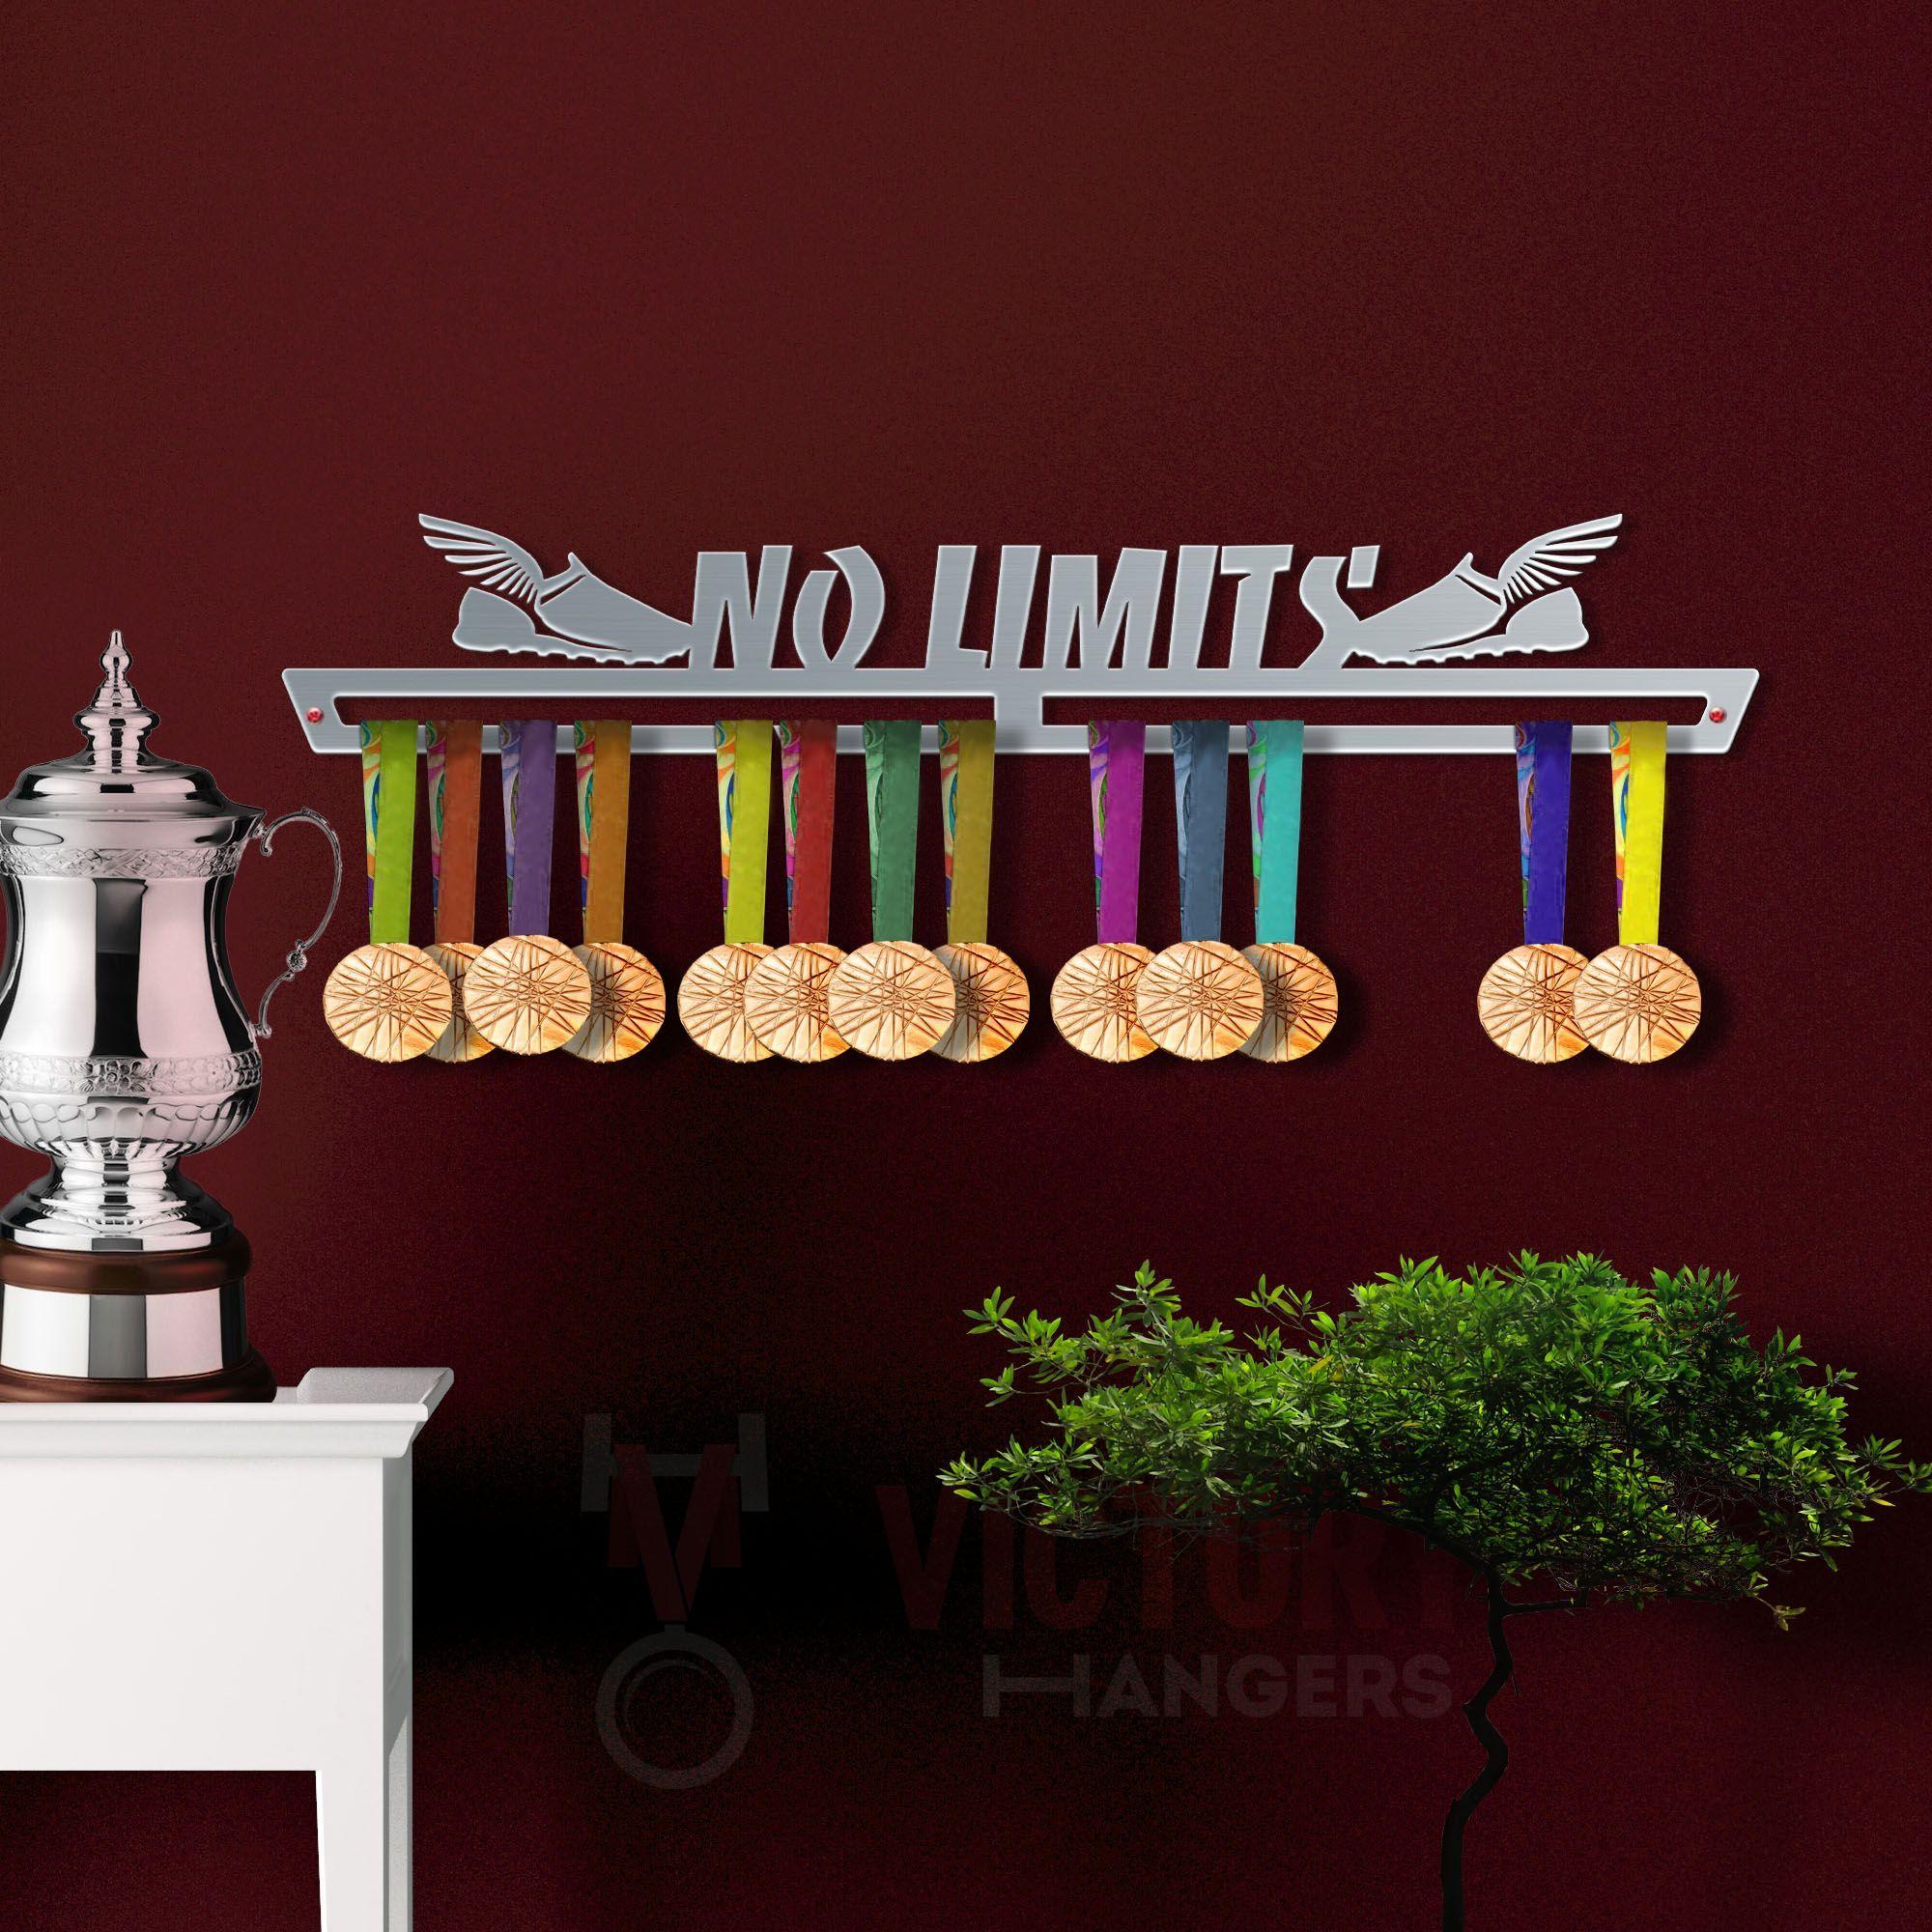 Personalised Medal Hanger Holder Display Achievement Hook Board Plaque Rail Rack